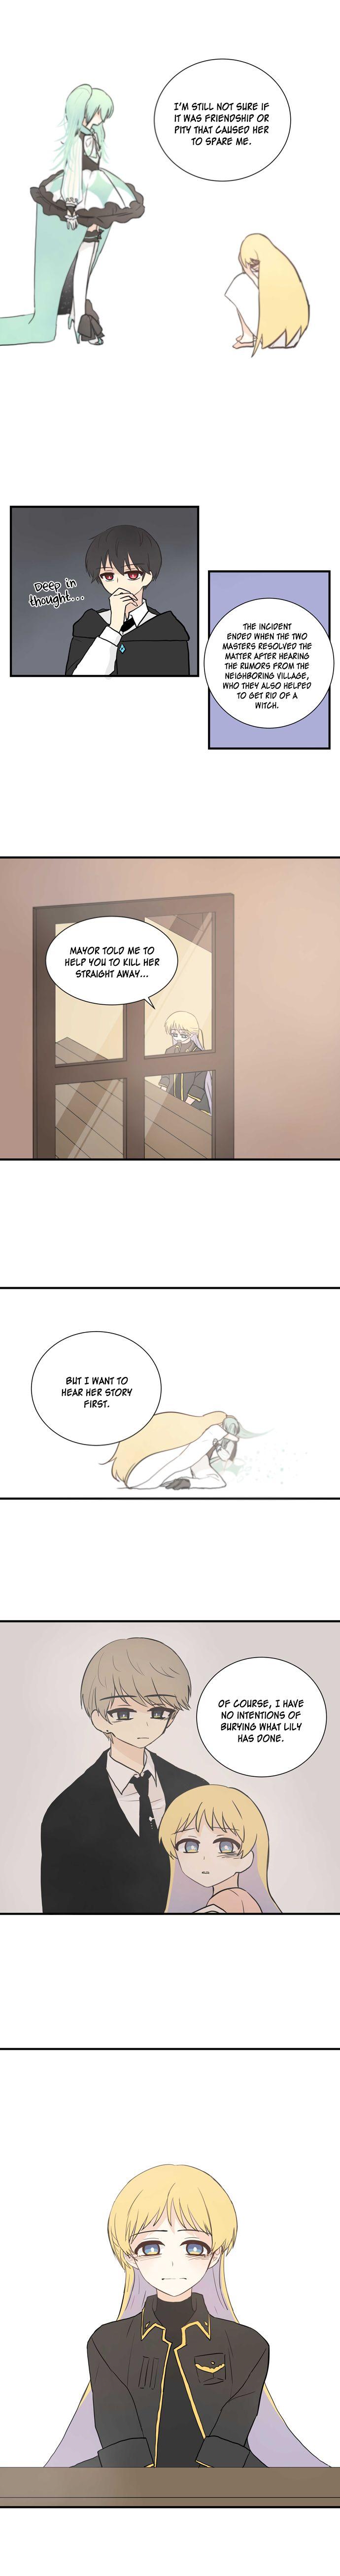 Doll (maen) - Chapter 12